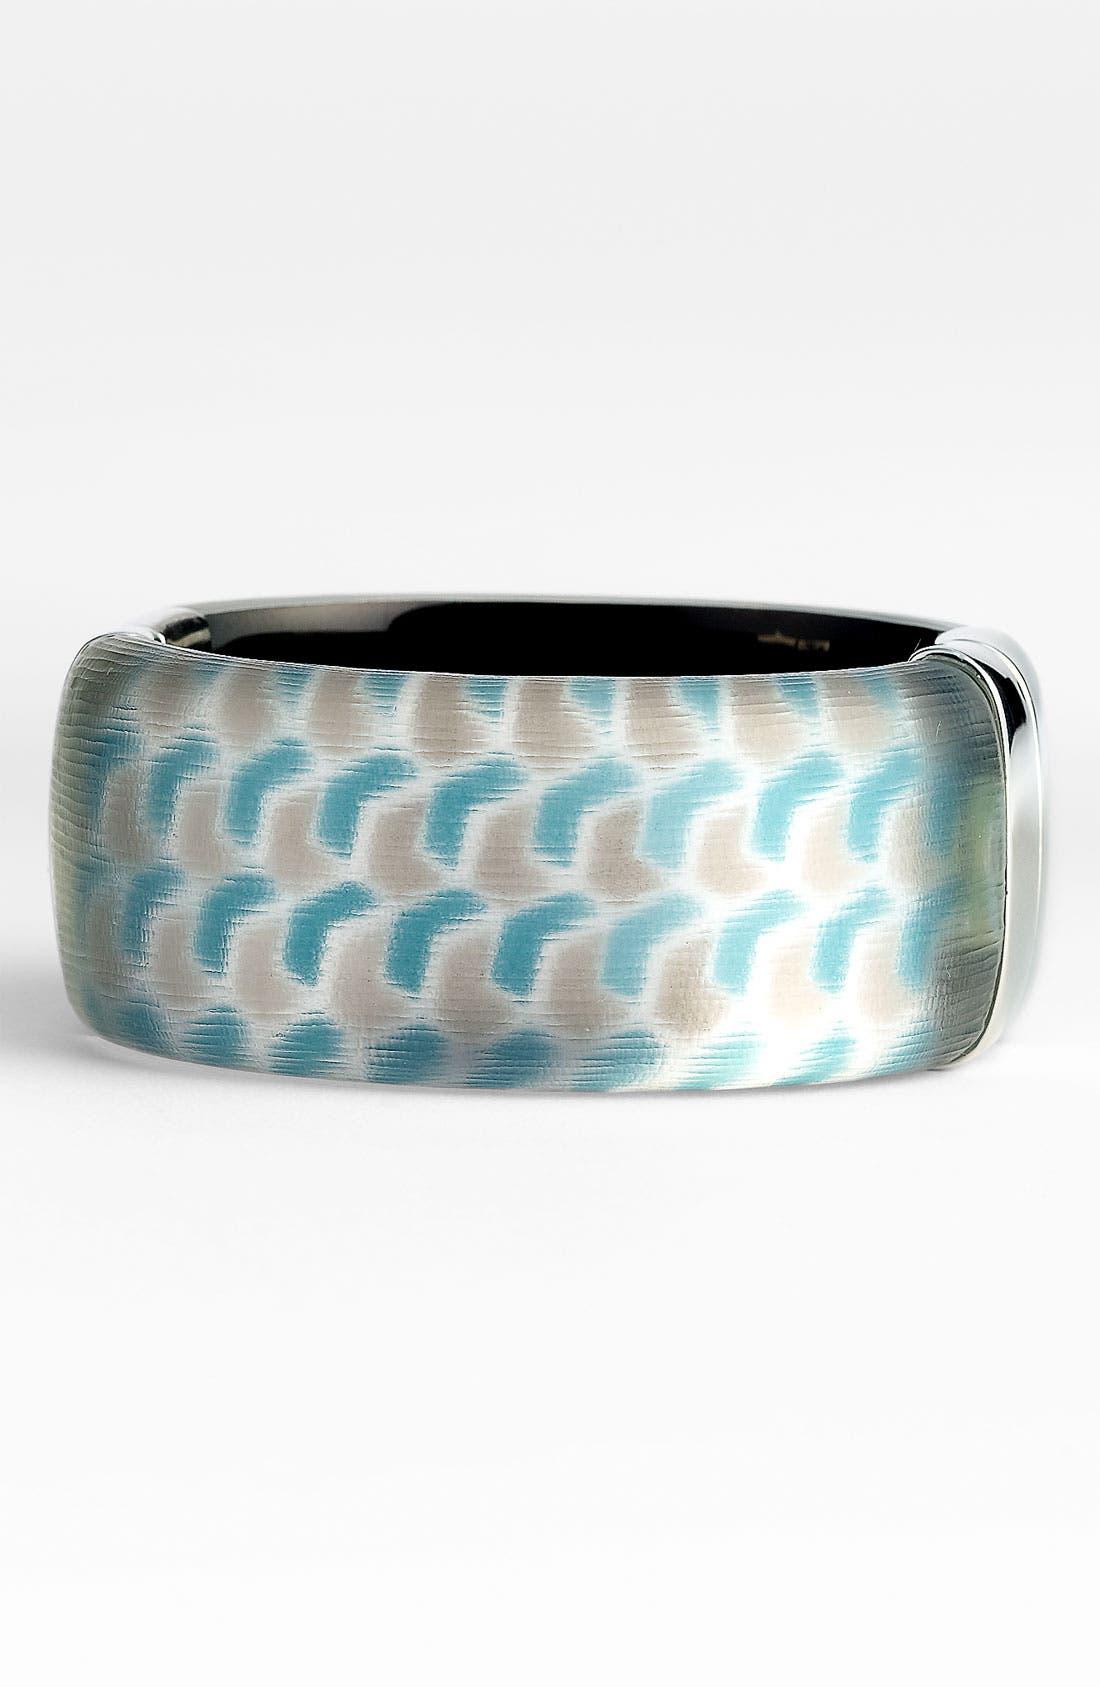 Main Image - Alexis Bittar 'Deco' Hinged Bracelet (Nordstrom Exclusive)